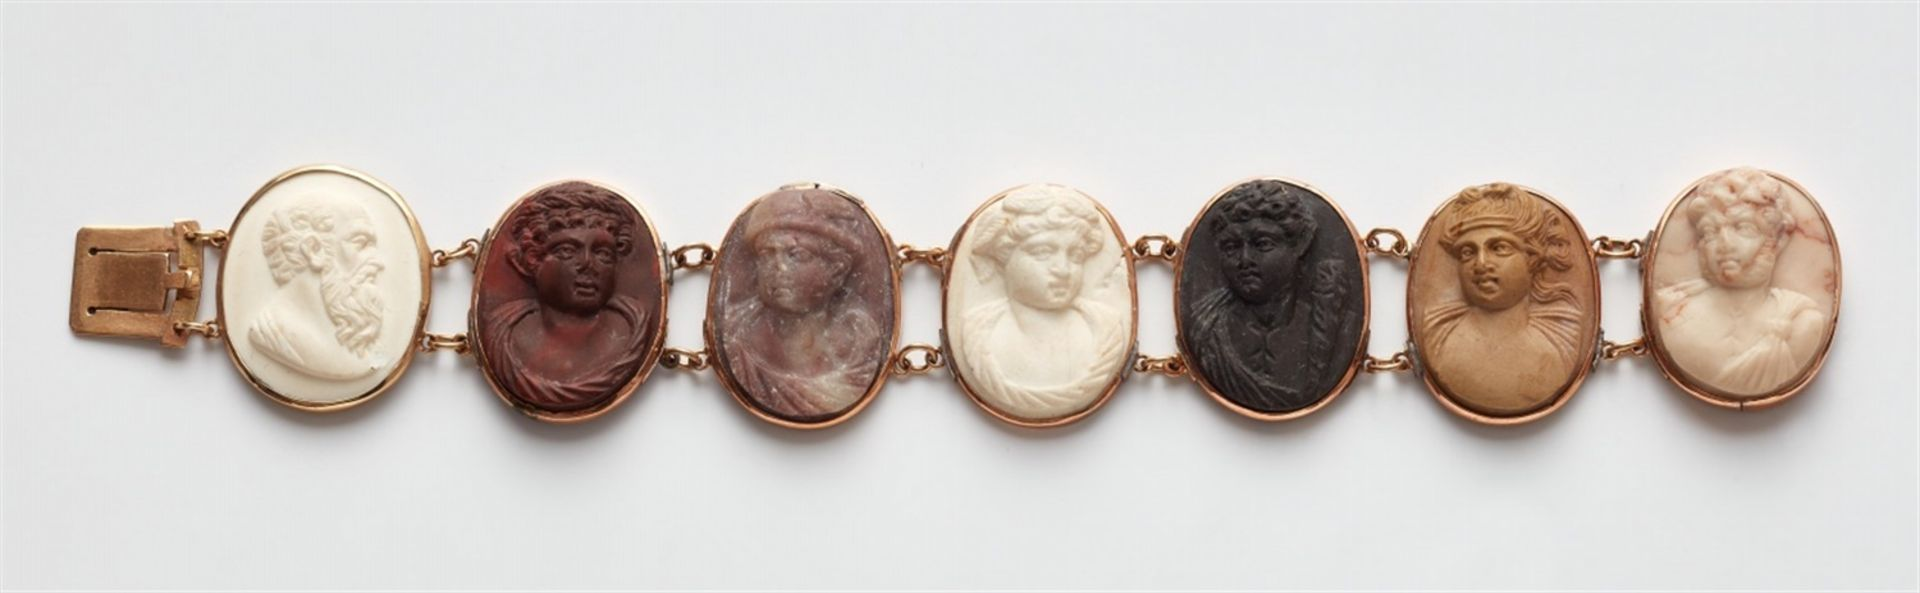 Souvenir-Armband mit Lavakameen